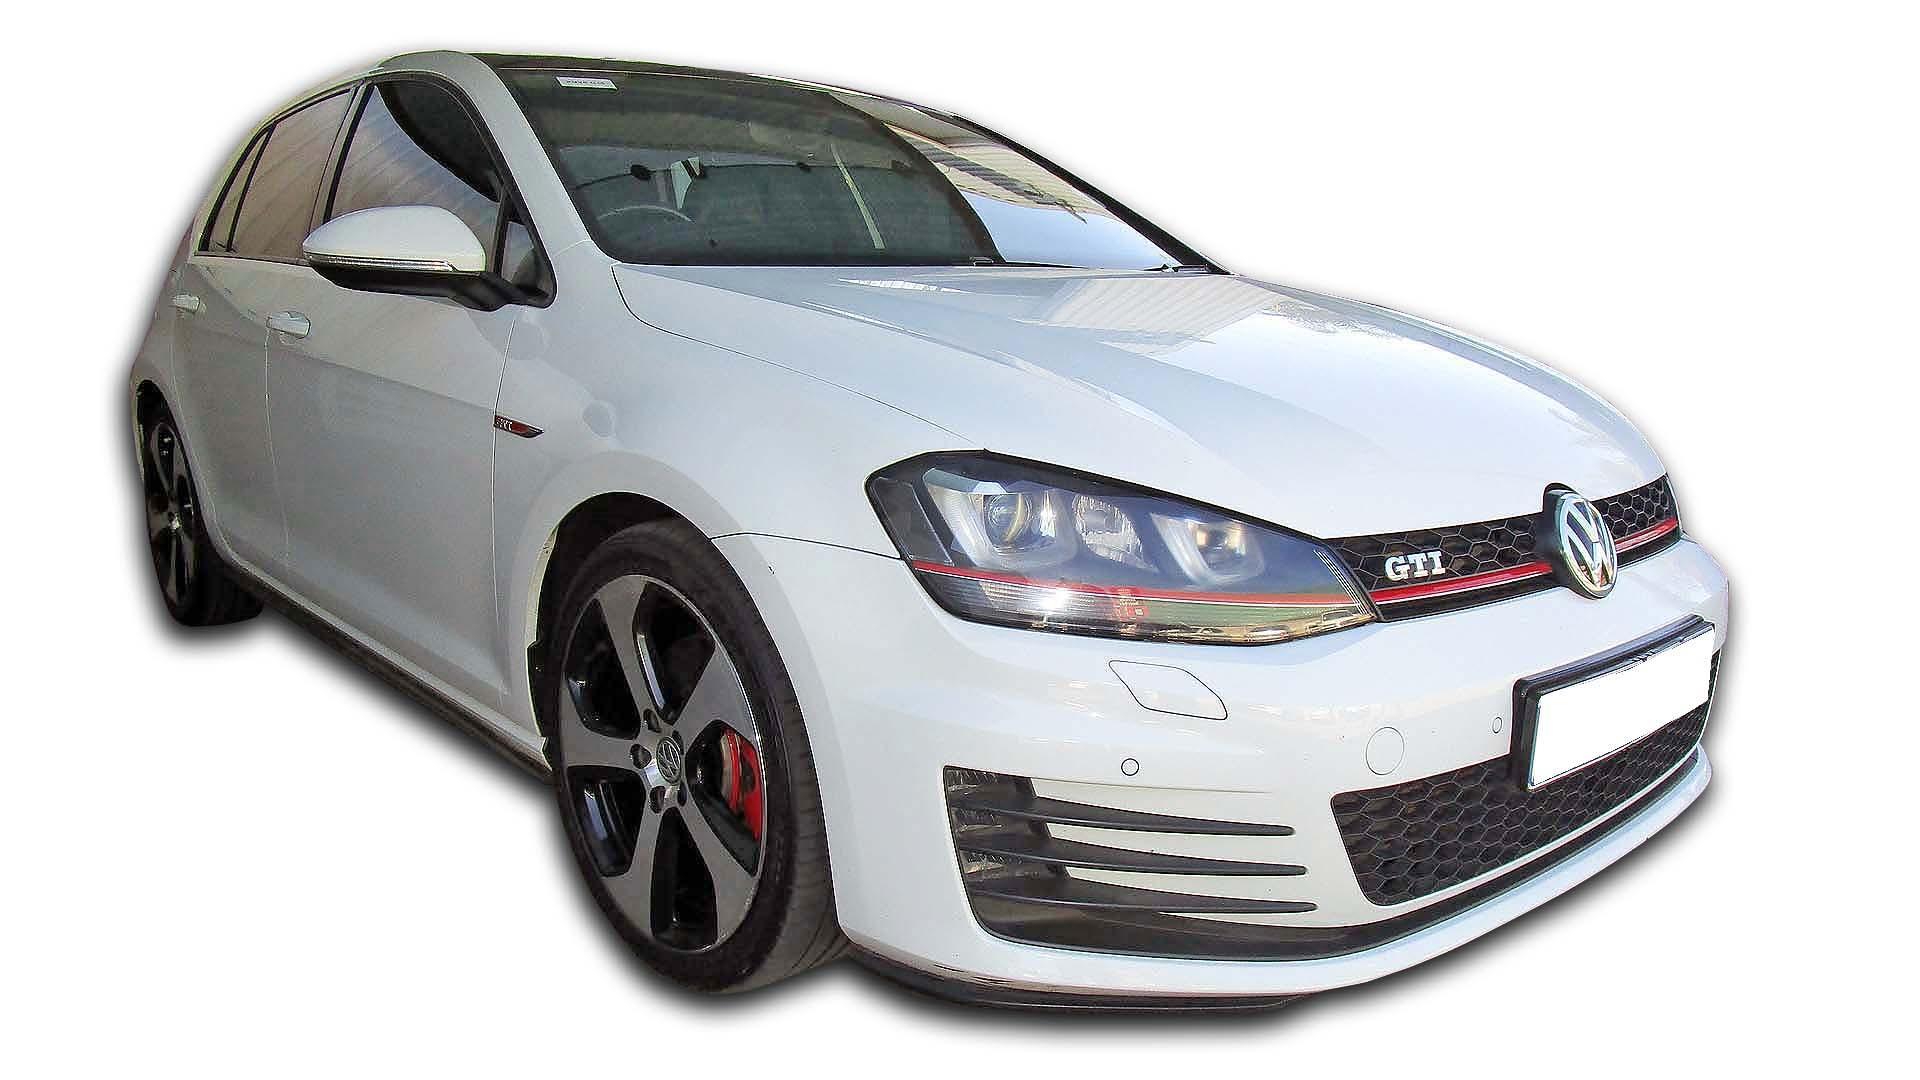 VW Golf 7 Gti 2.0 TS